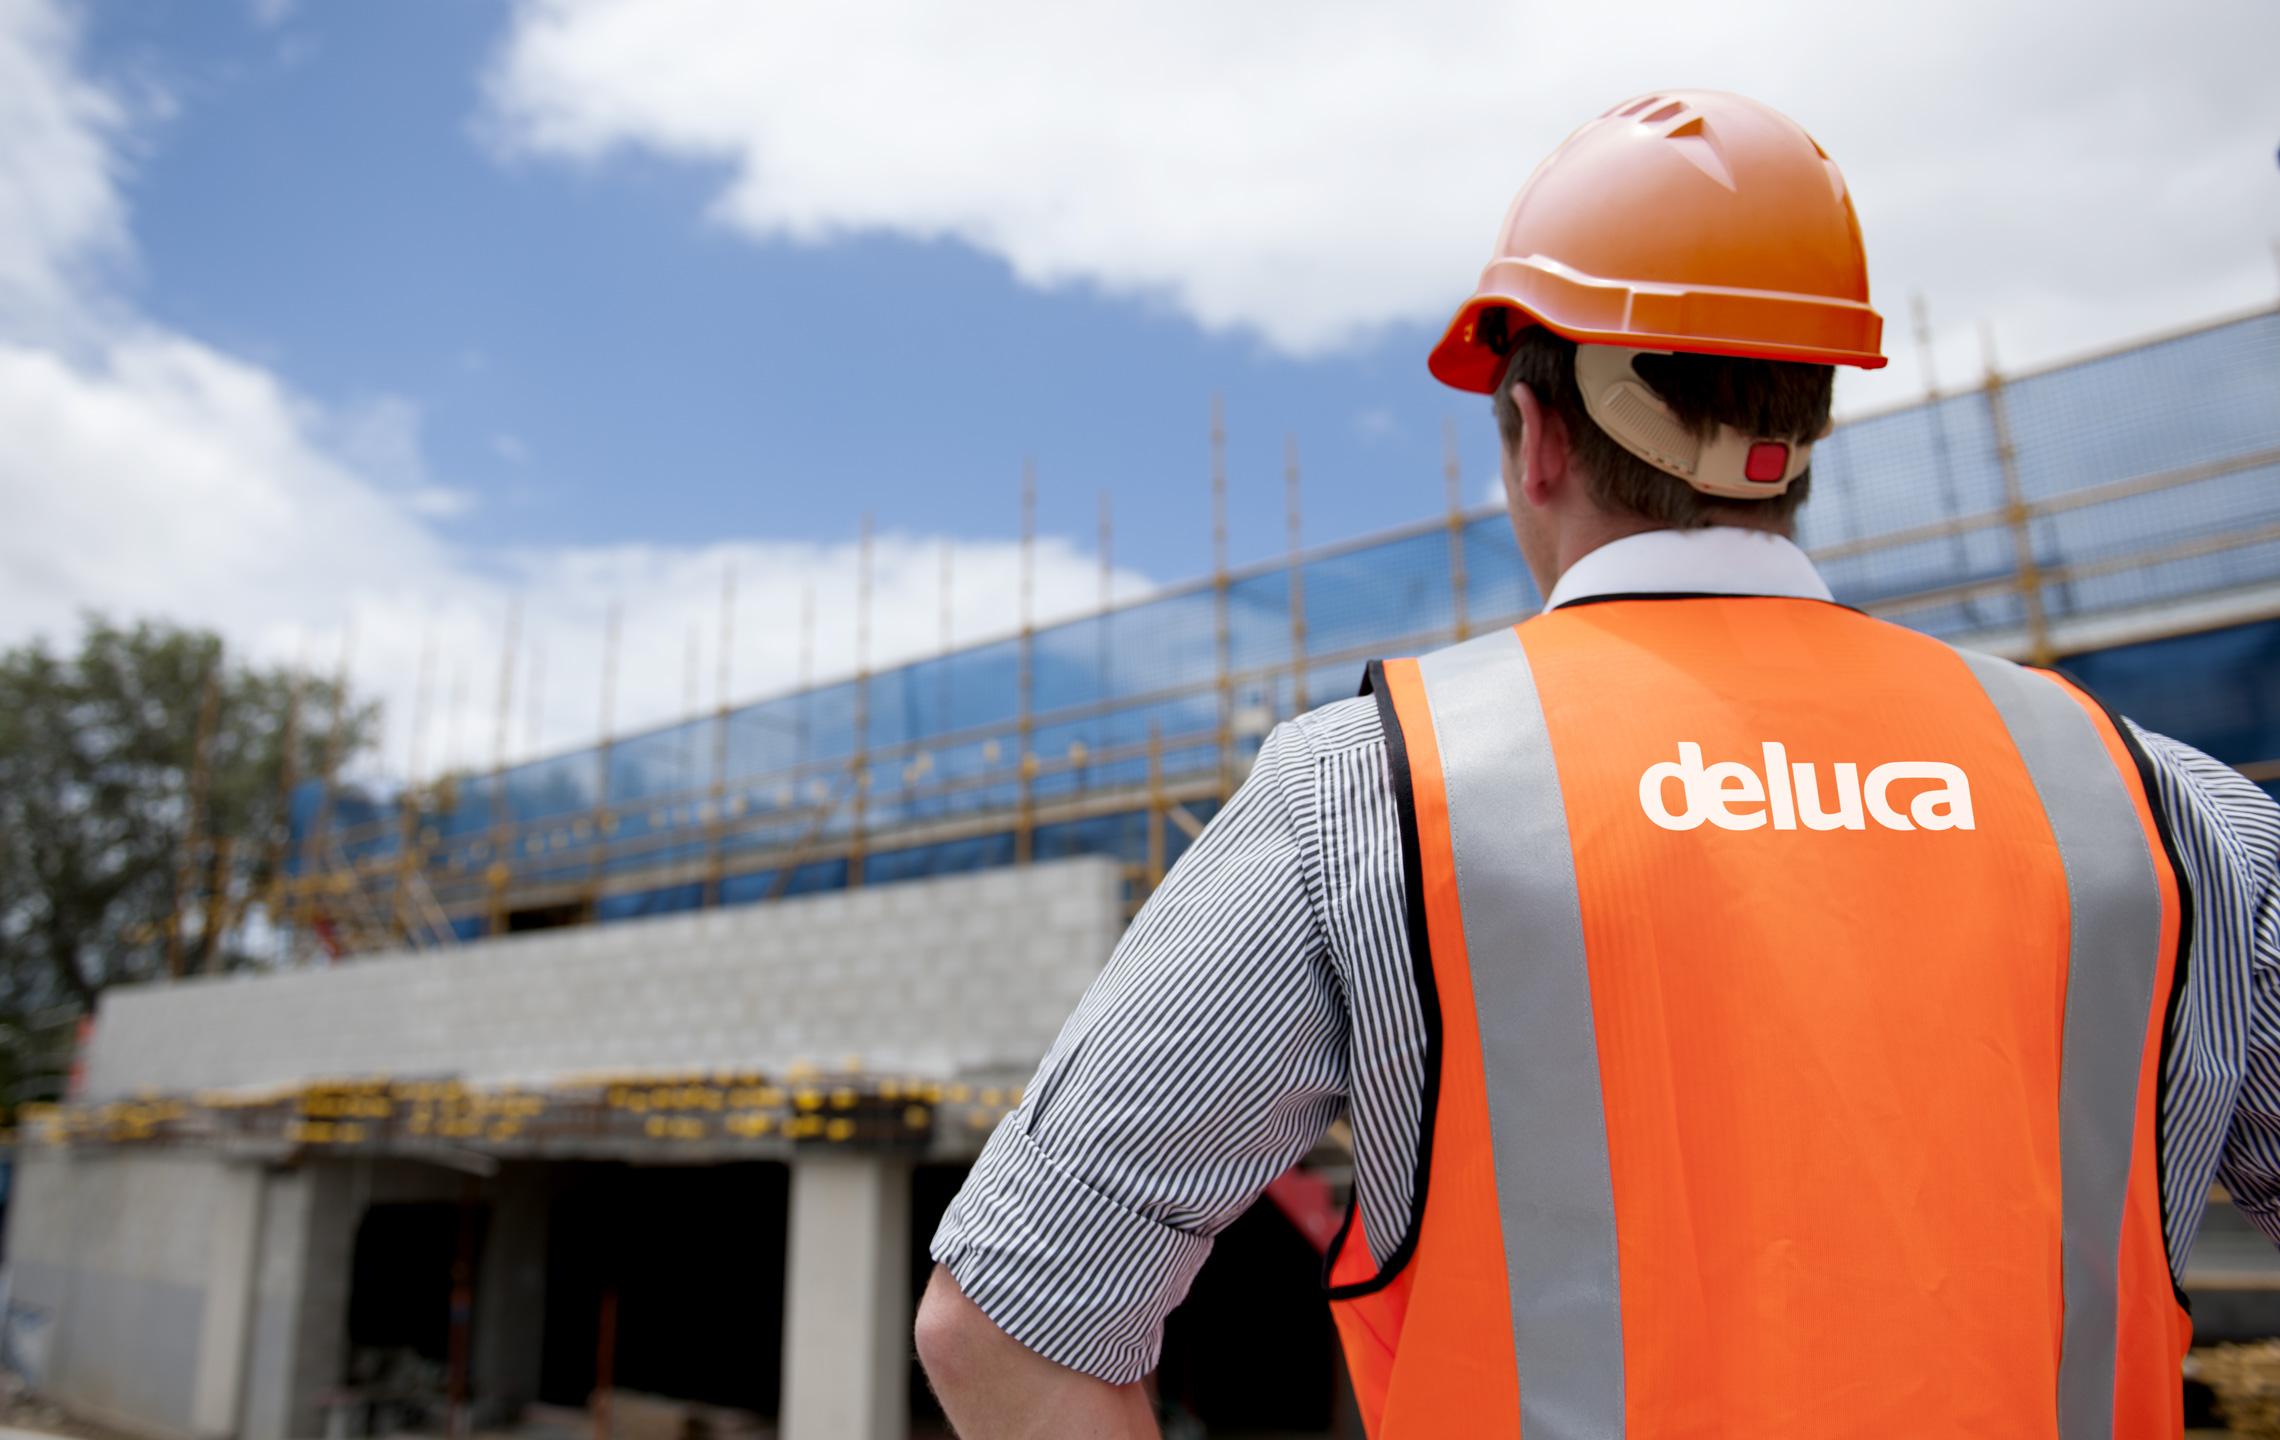 De Luca building site high viz